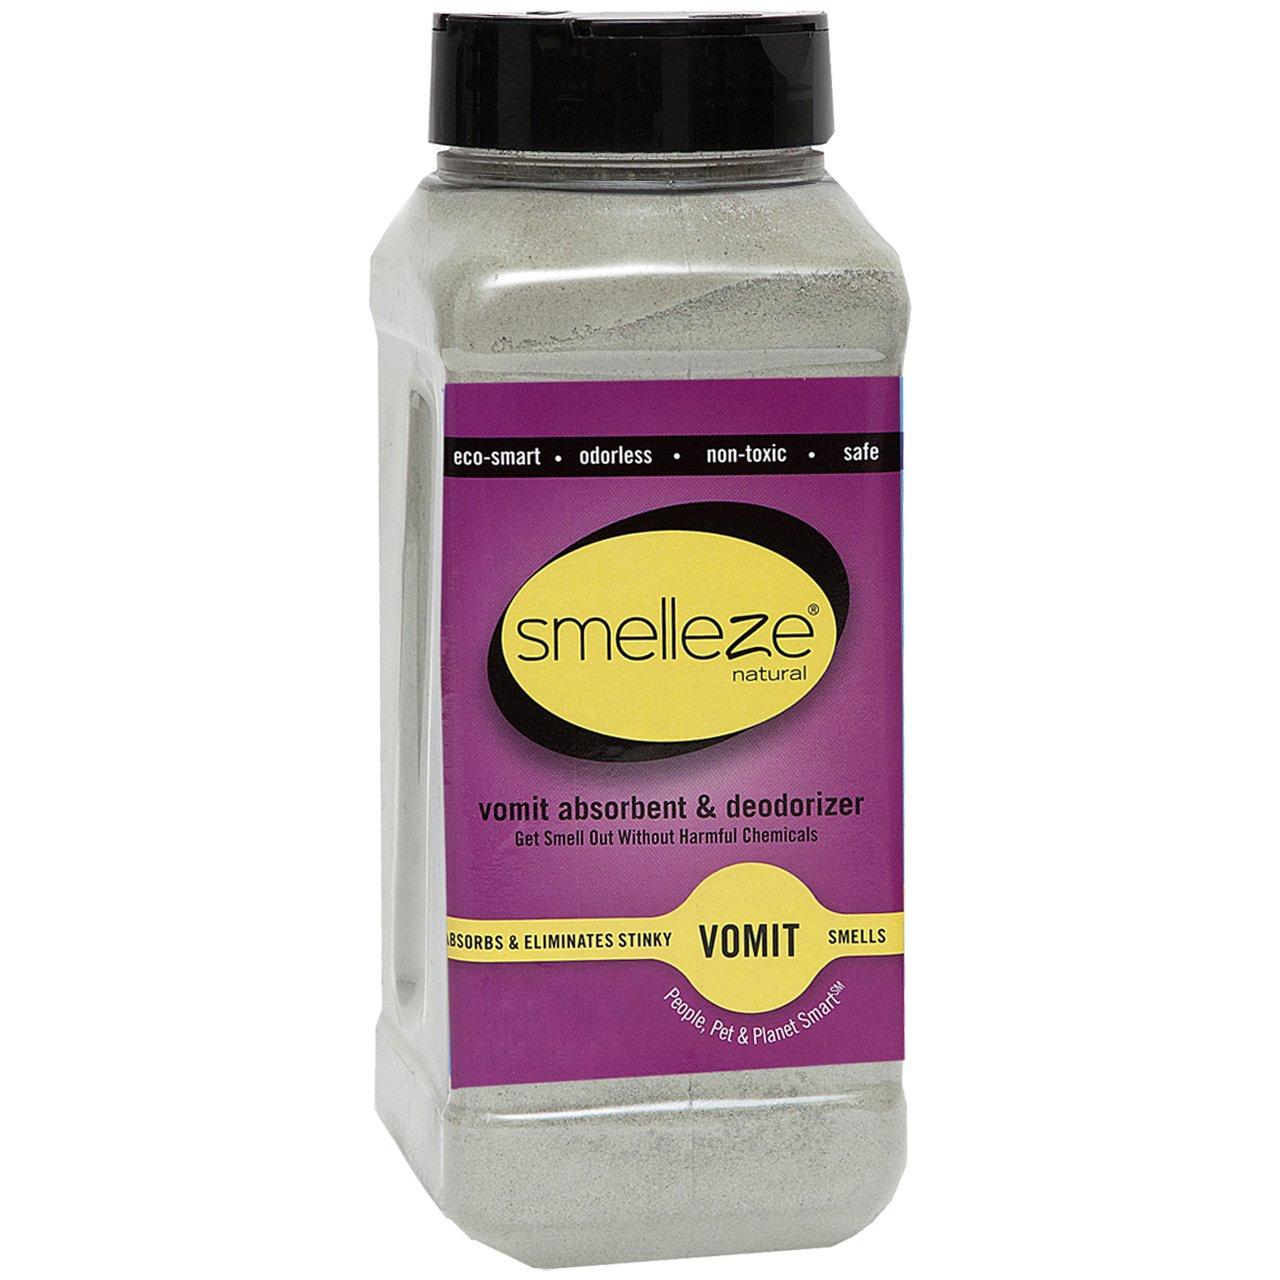 smelleze vomi naturel & Odeur absorbant?: 2lb. Granules Vomissant Stop odeur IMTEK Environmental Corp.